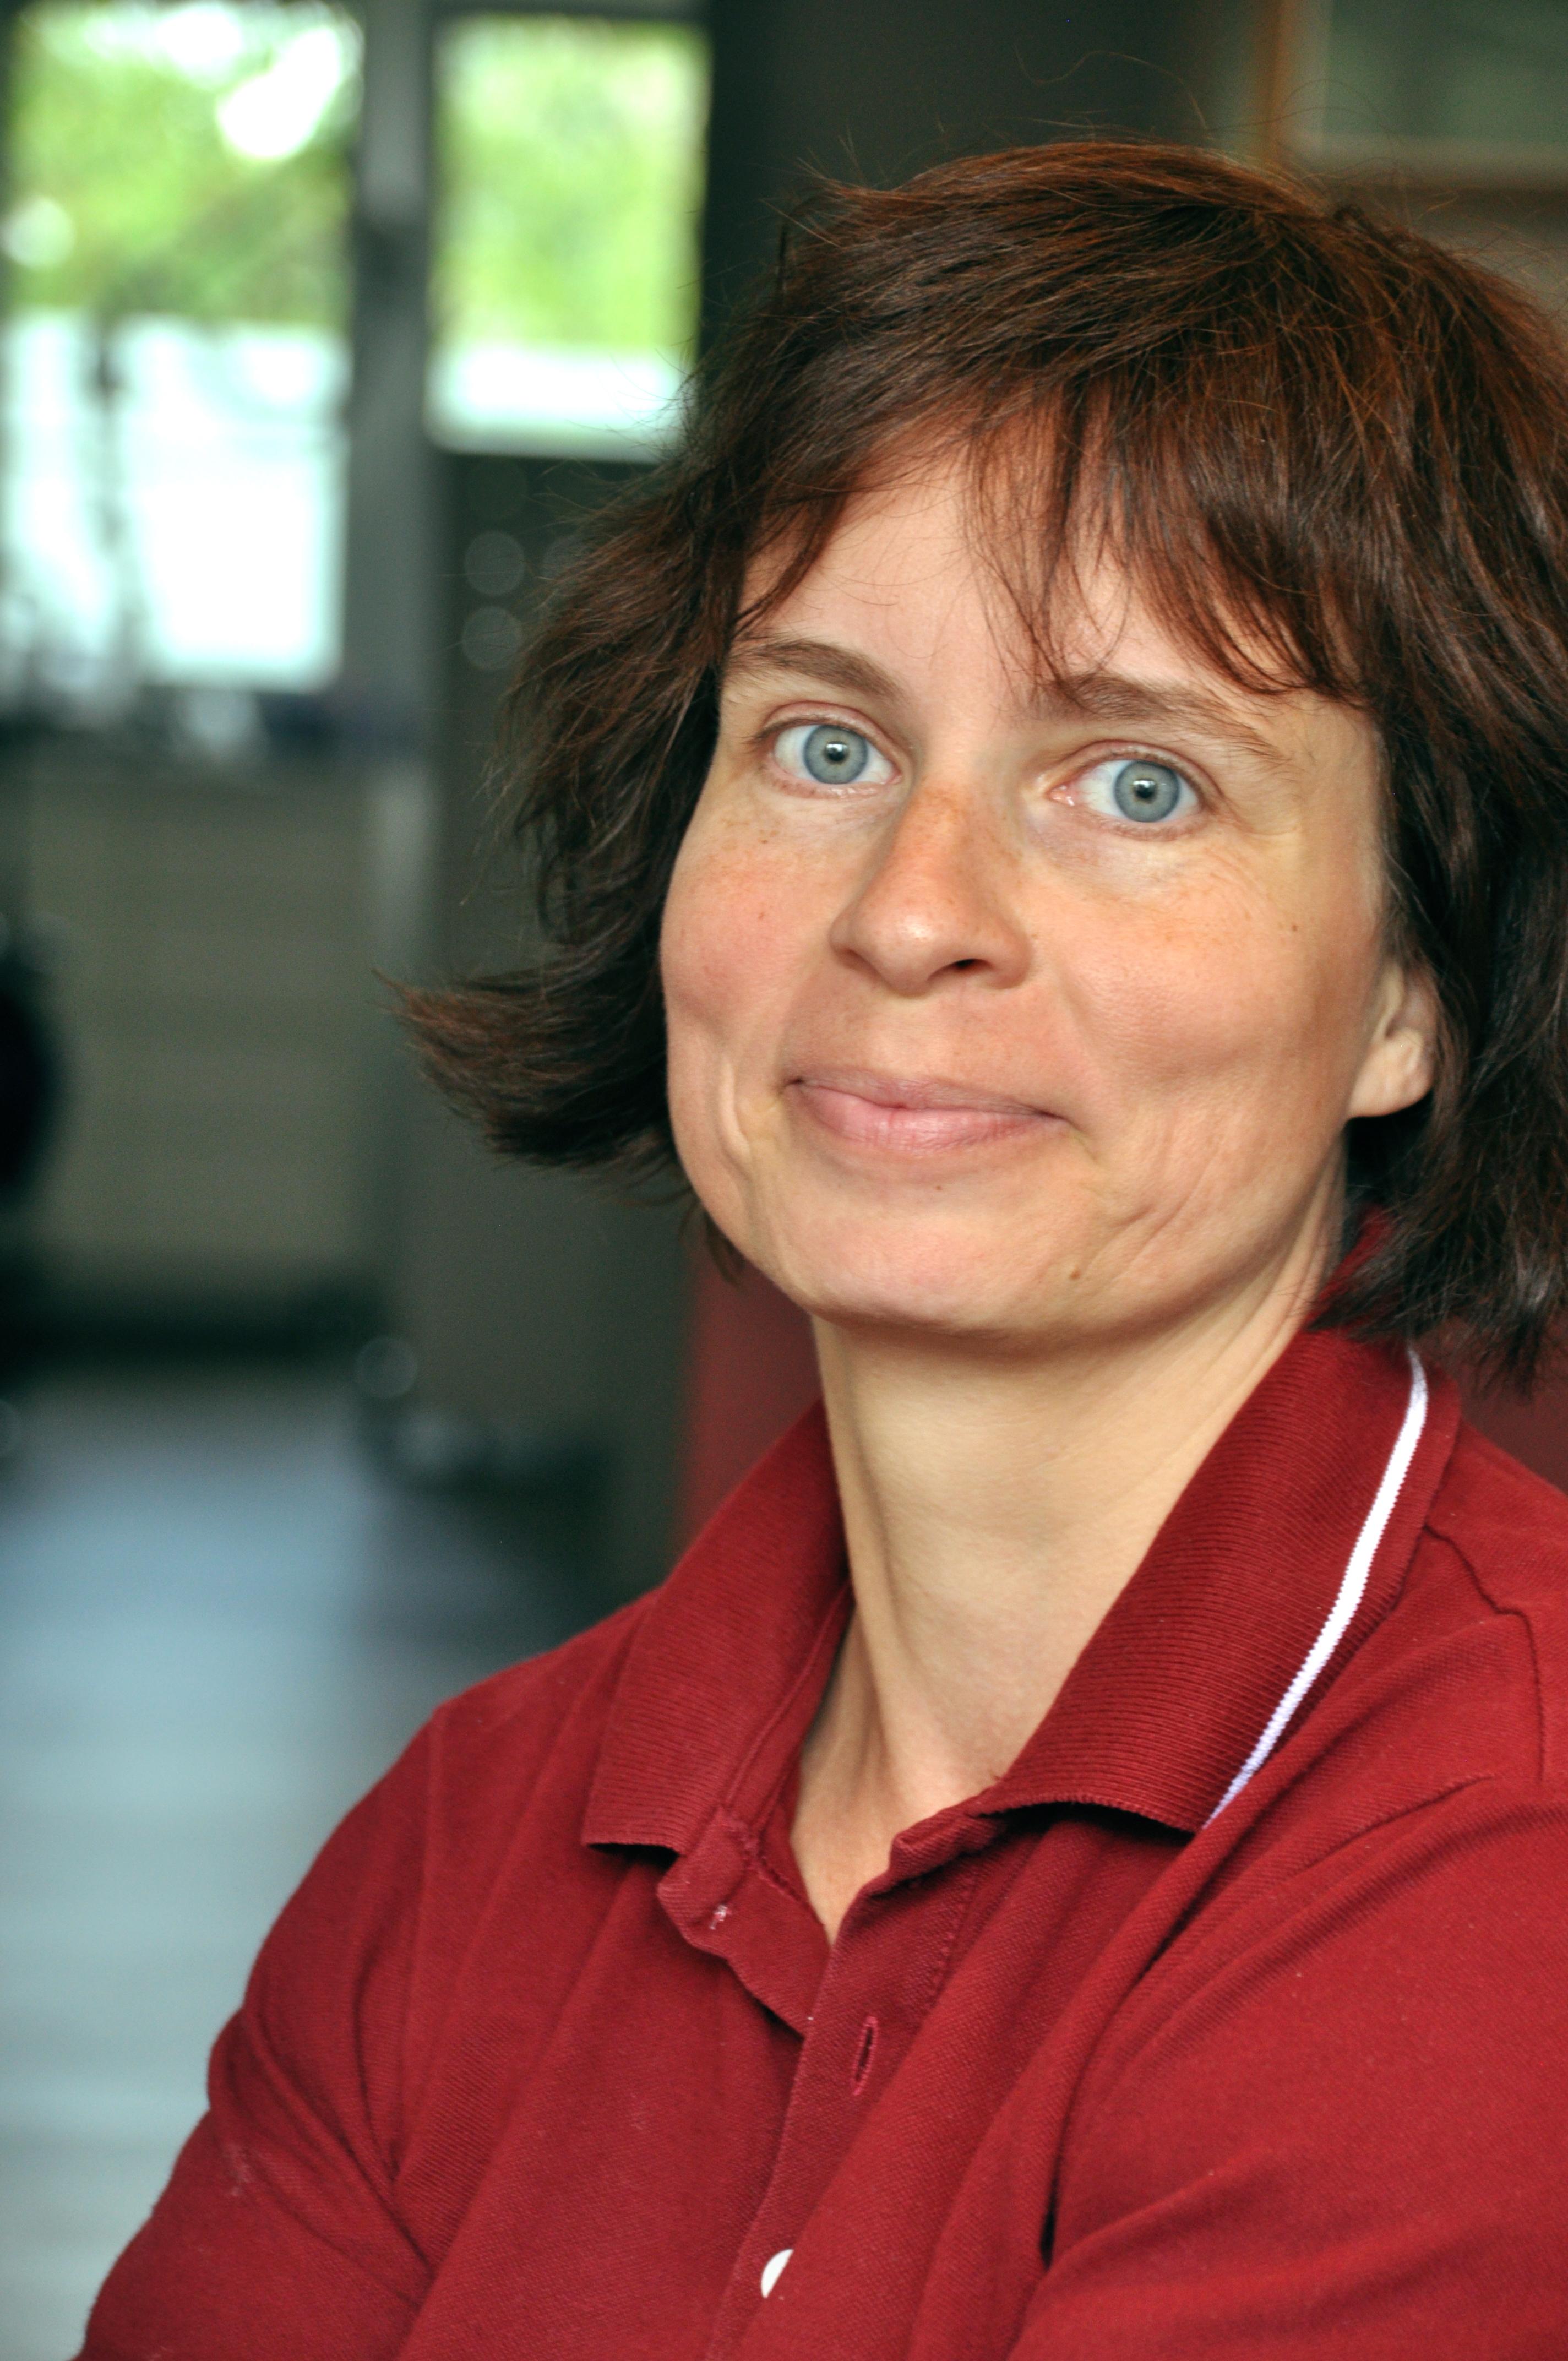 Dr. Angela Geißler